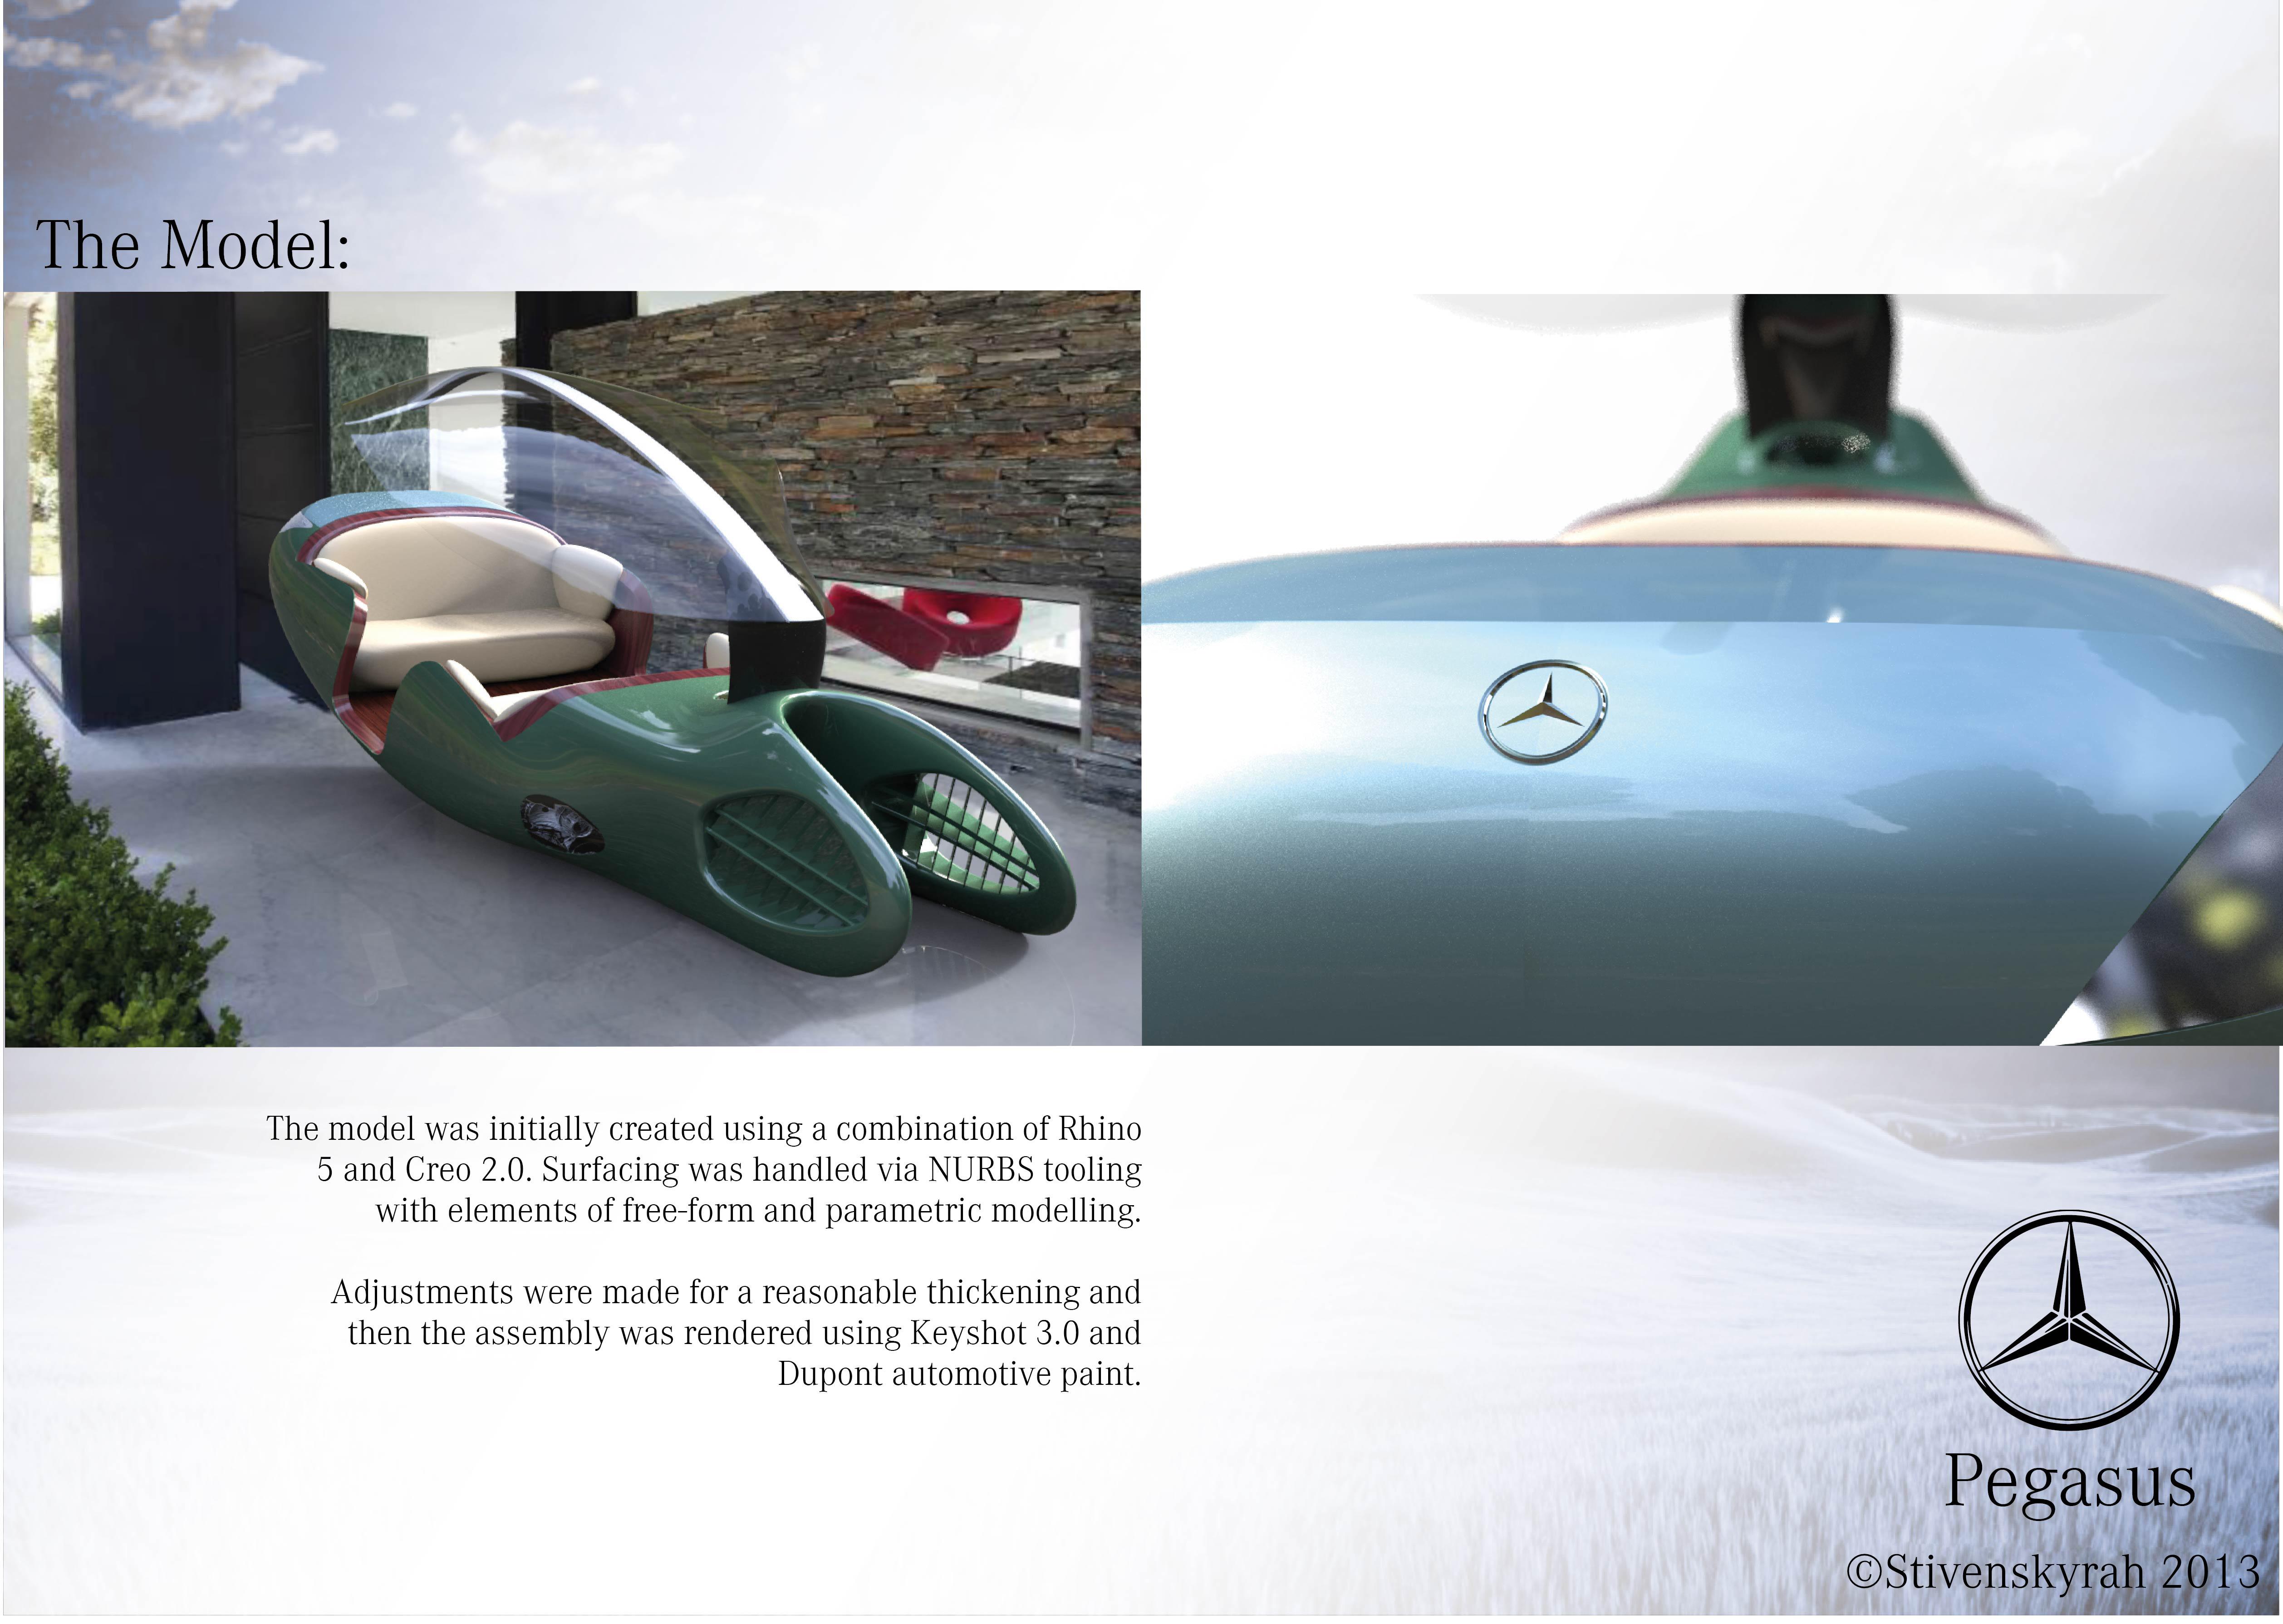 09-renders-pegasus-stivenskyrah-designwithlove